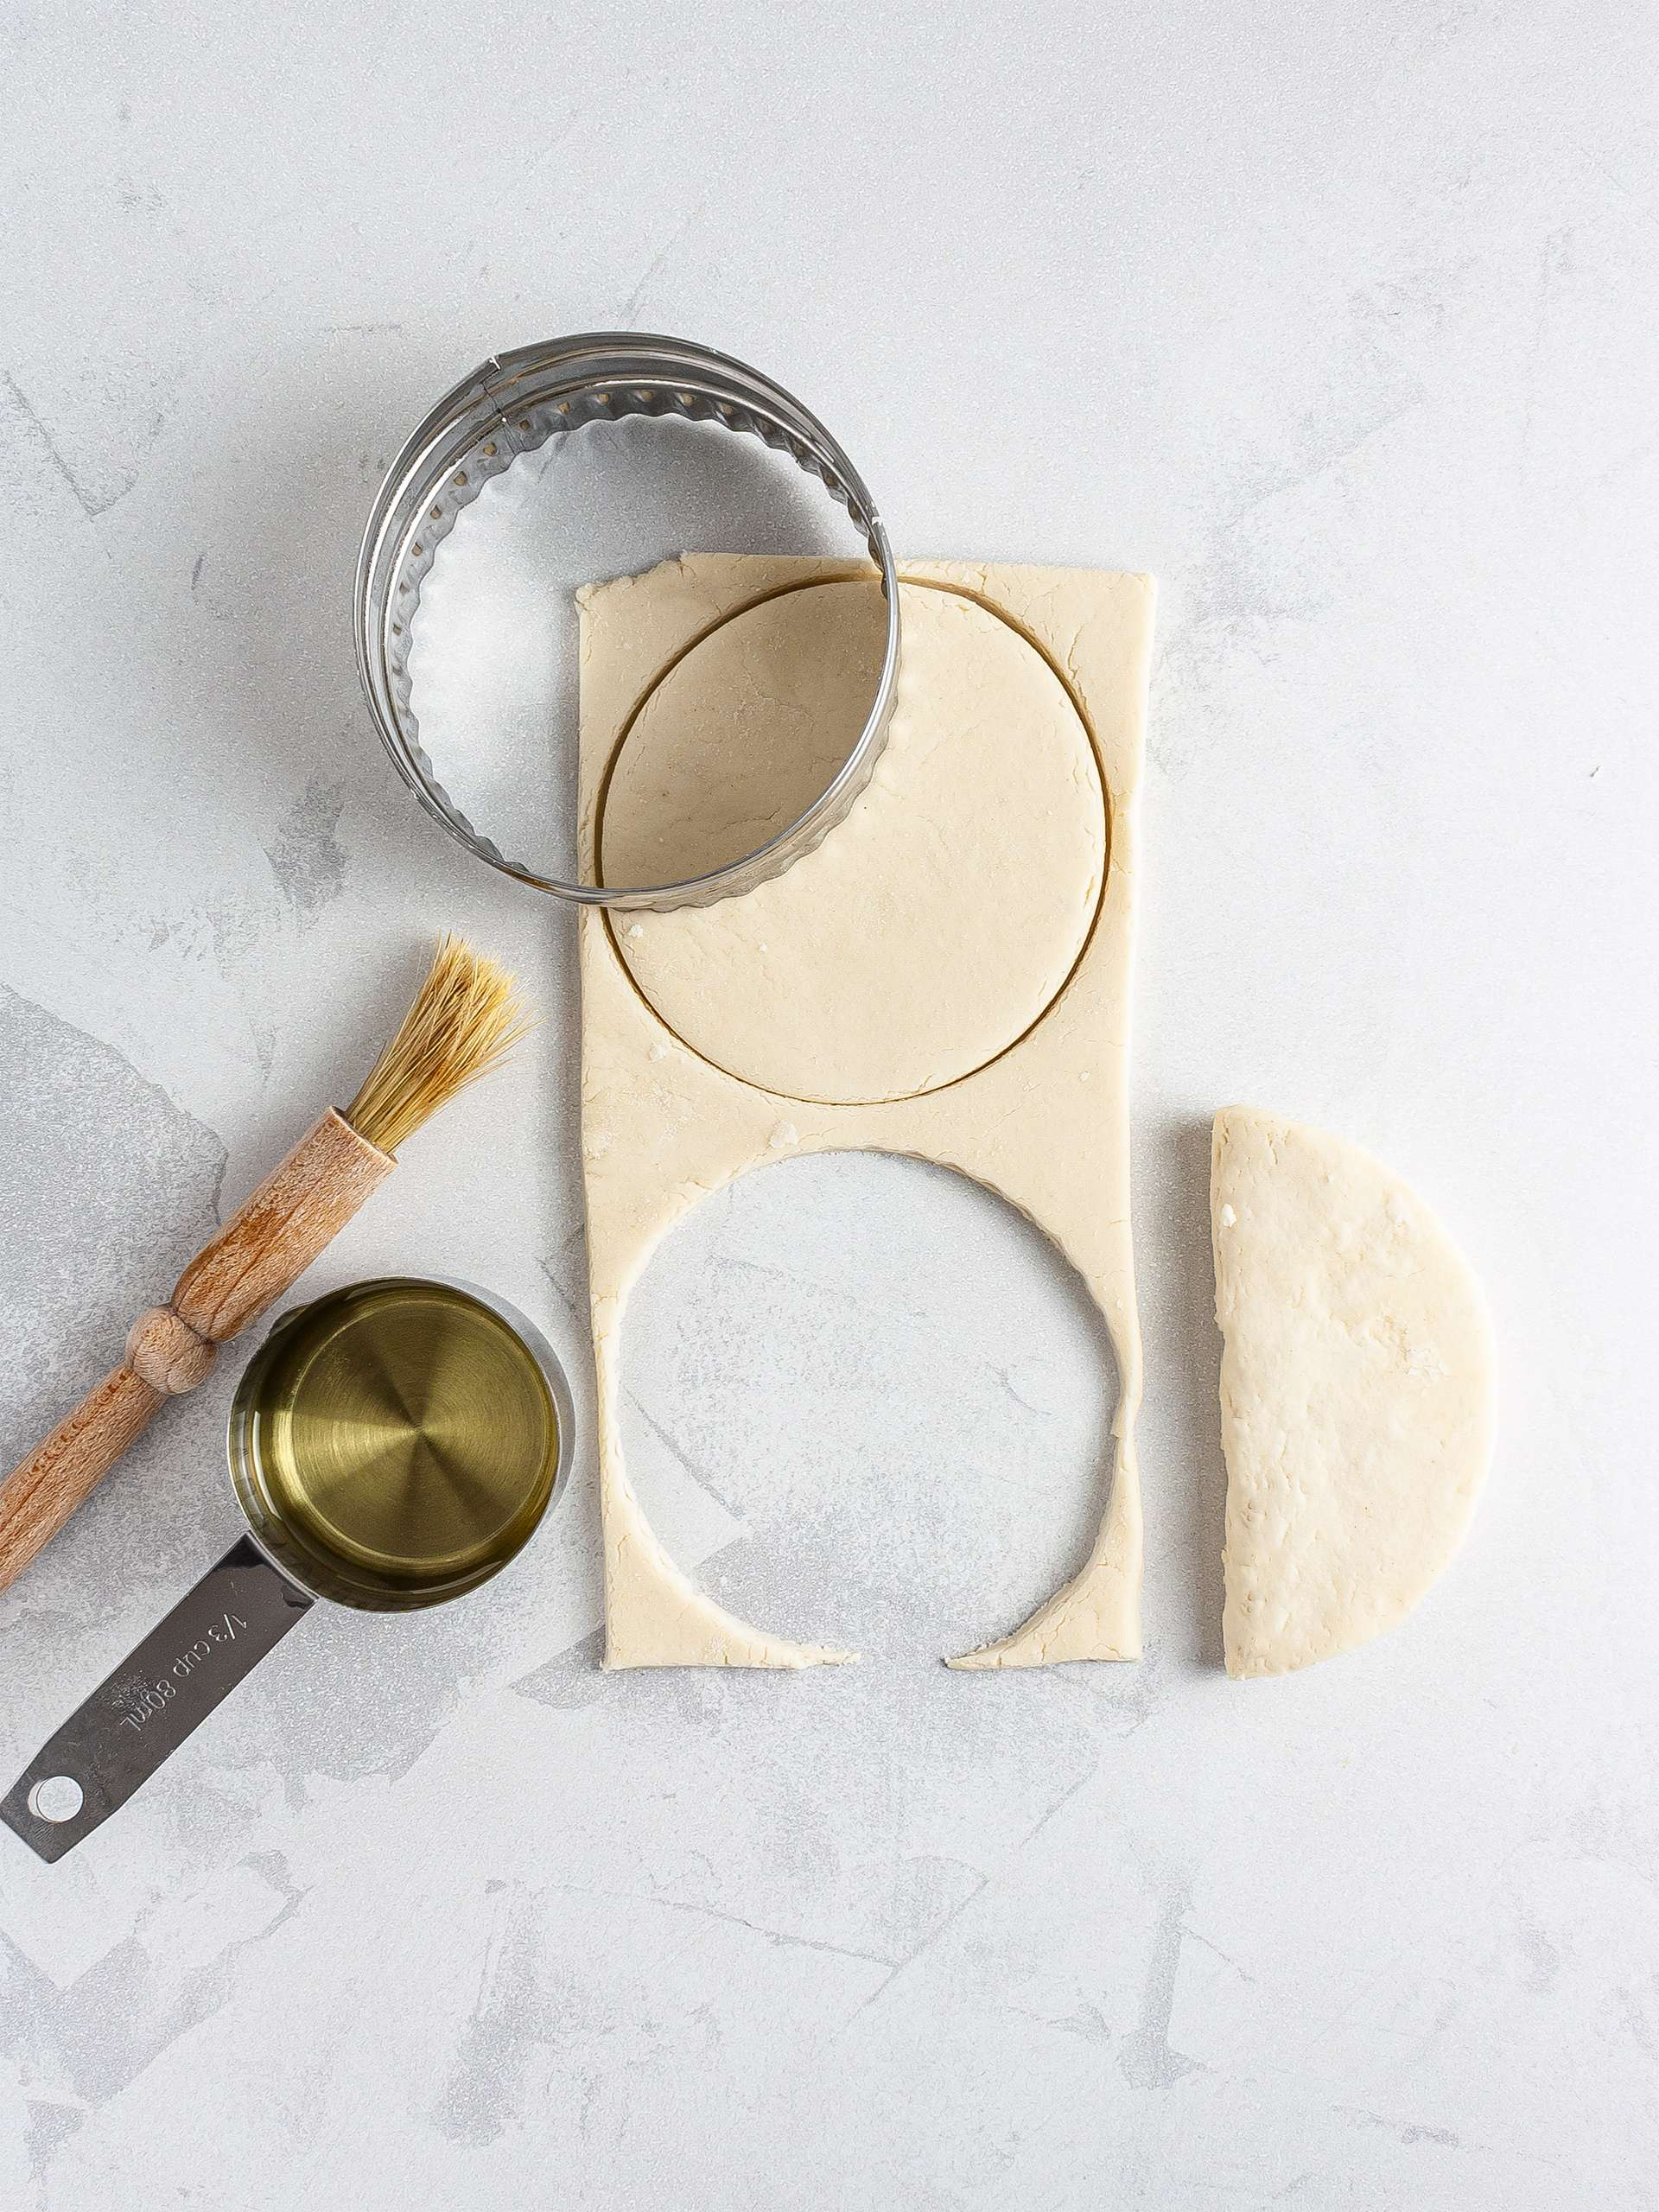 Cut out and folded bun dough